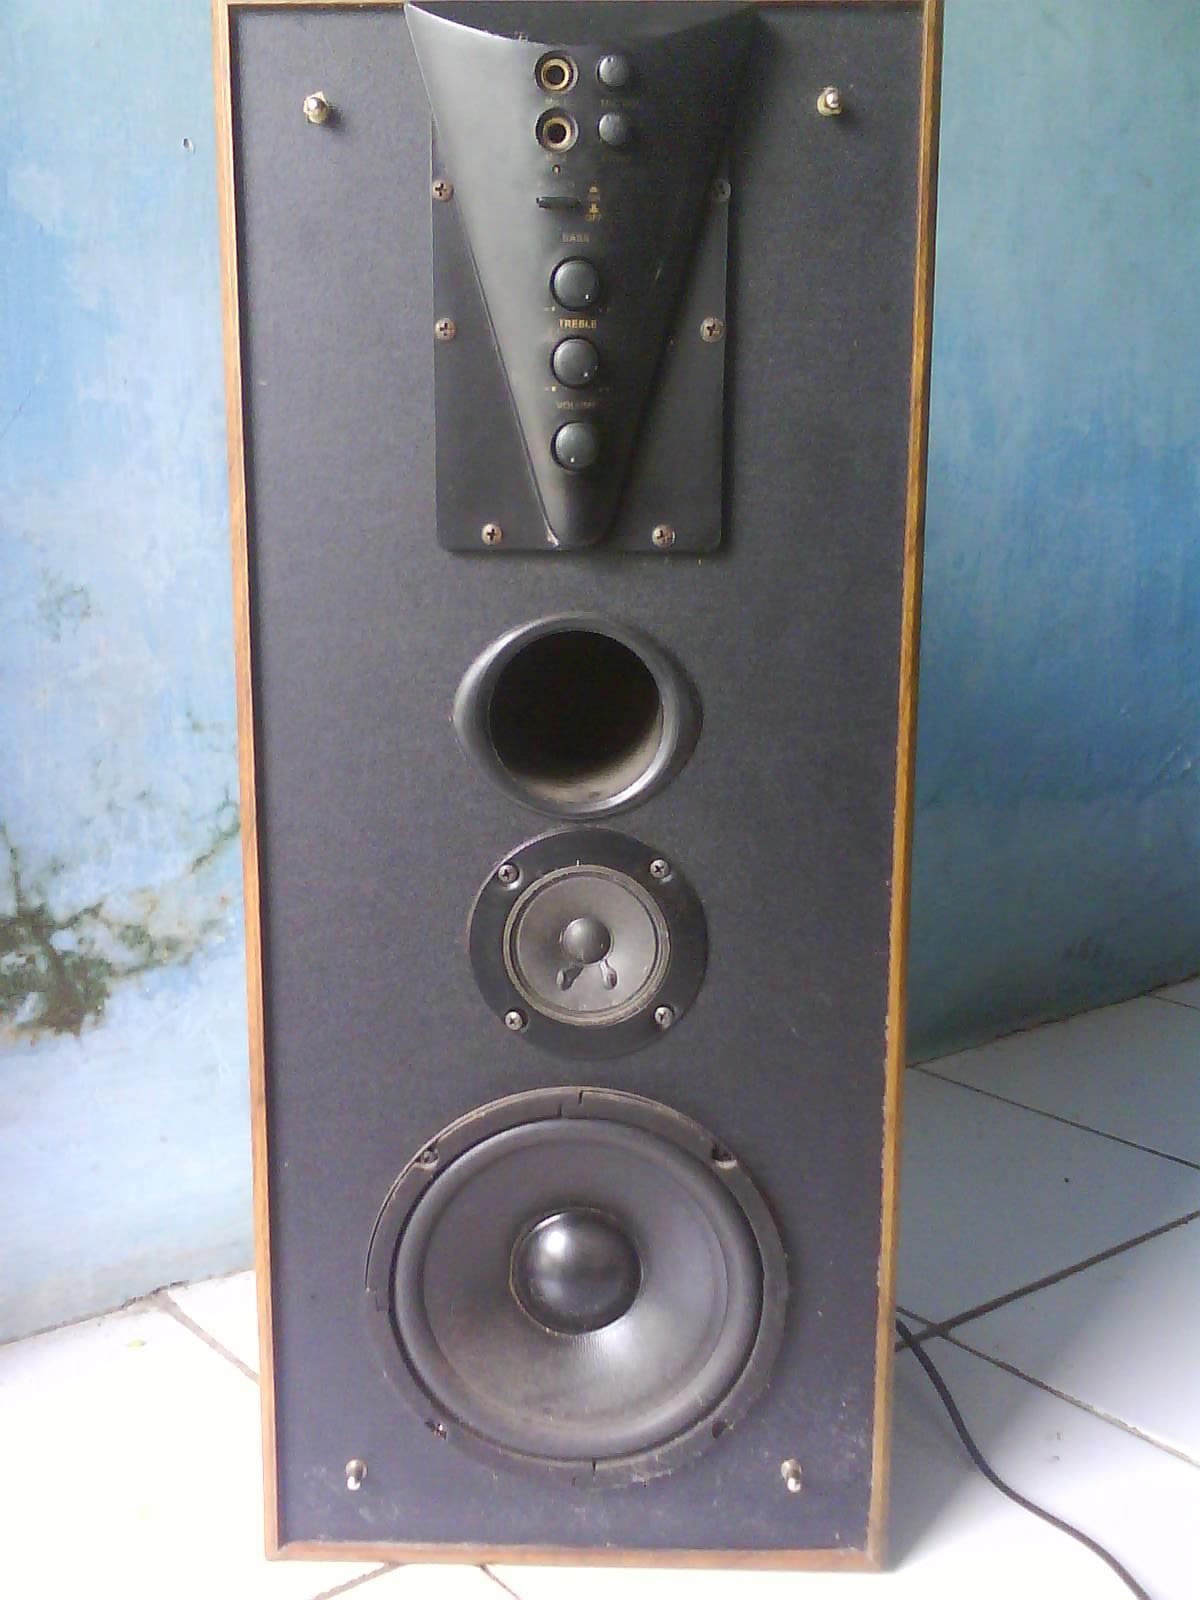 Elektronika Dan Otomotif 2010 Home Radio Bly94 100w Rf Power Amplifier Foto Sepeaker Aktif